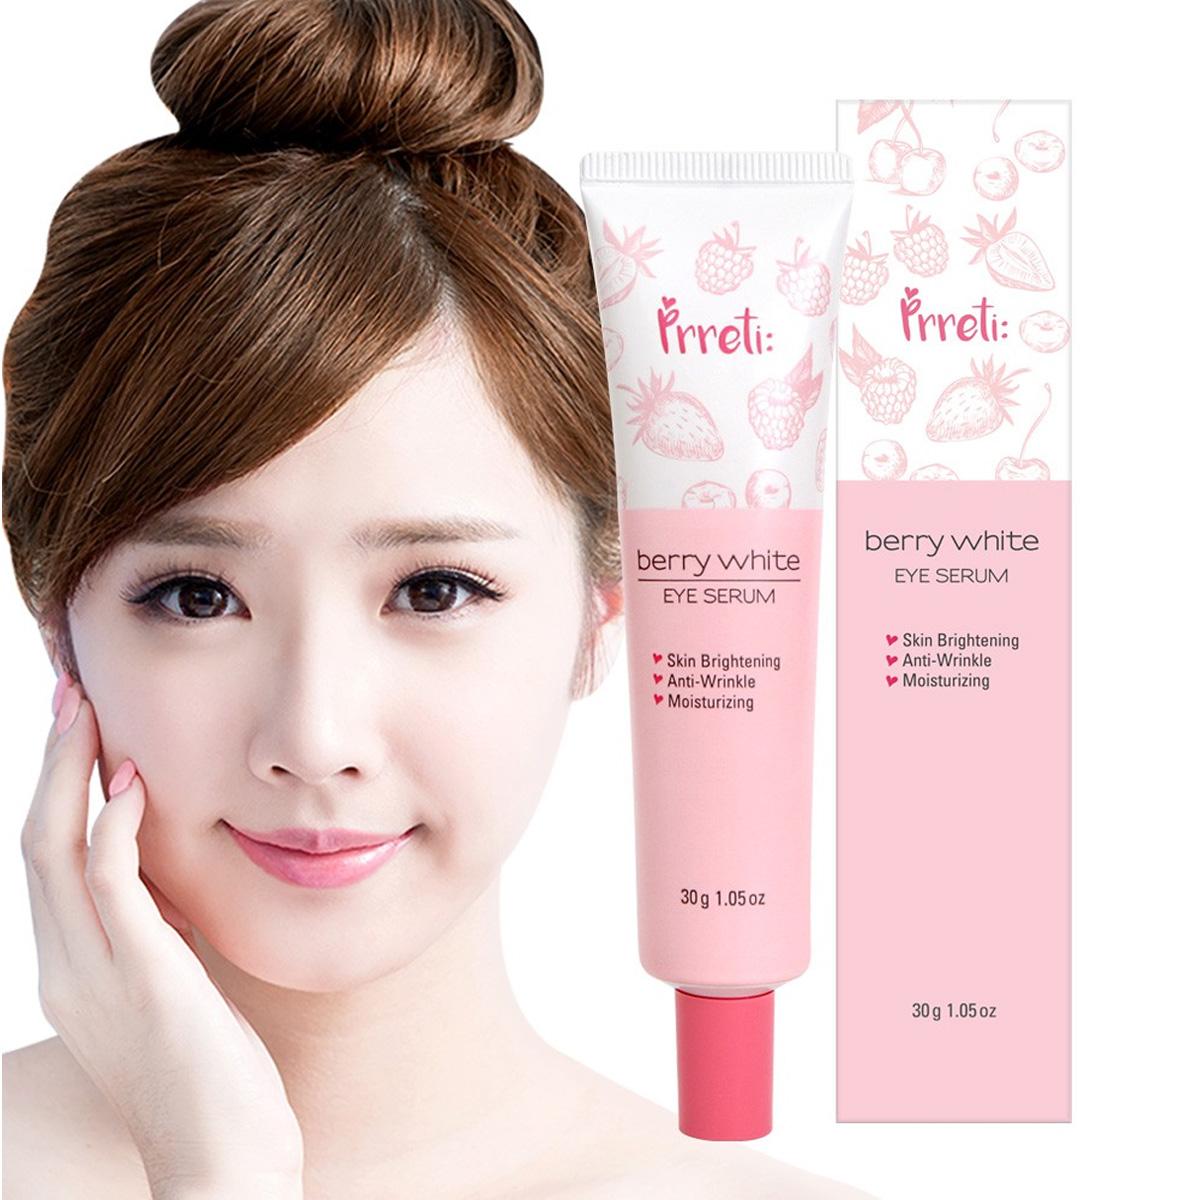 Crema Coreana Ojos Prreti Berry White Frutos Rojos Anti-envejecimiento